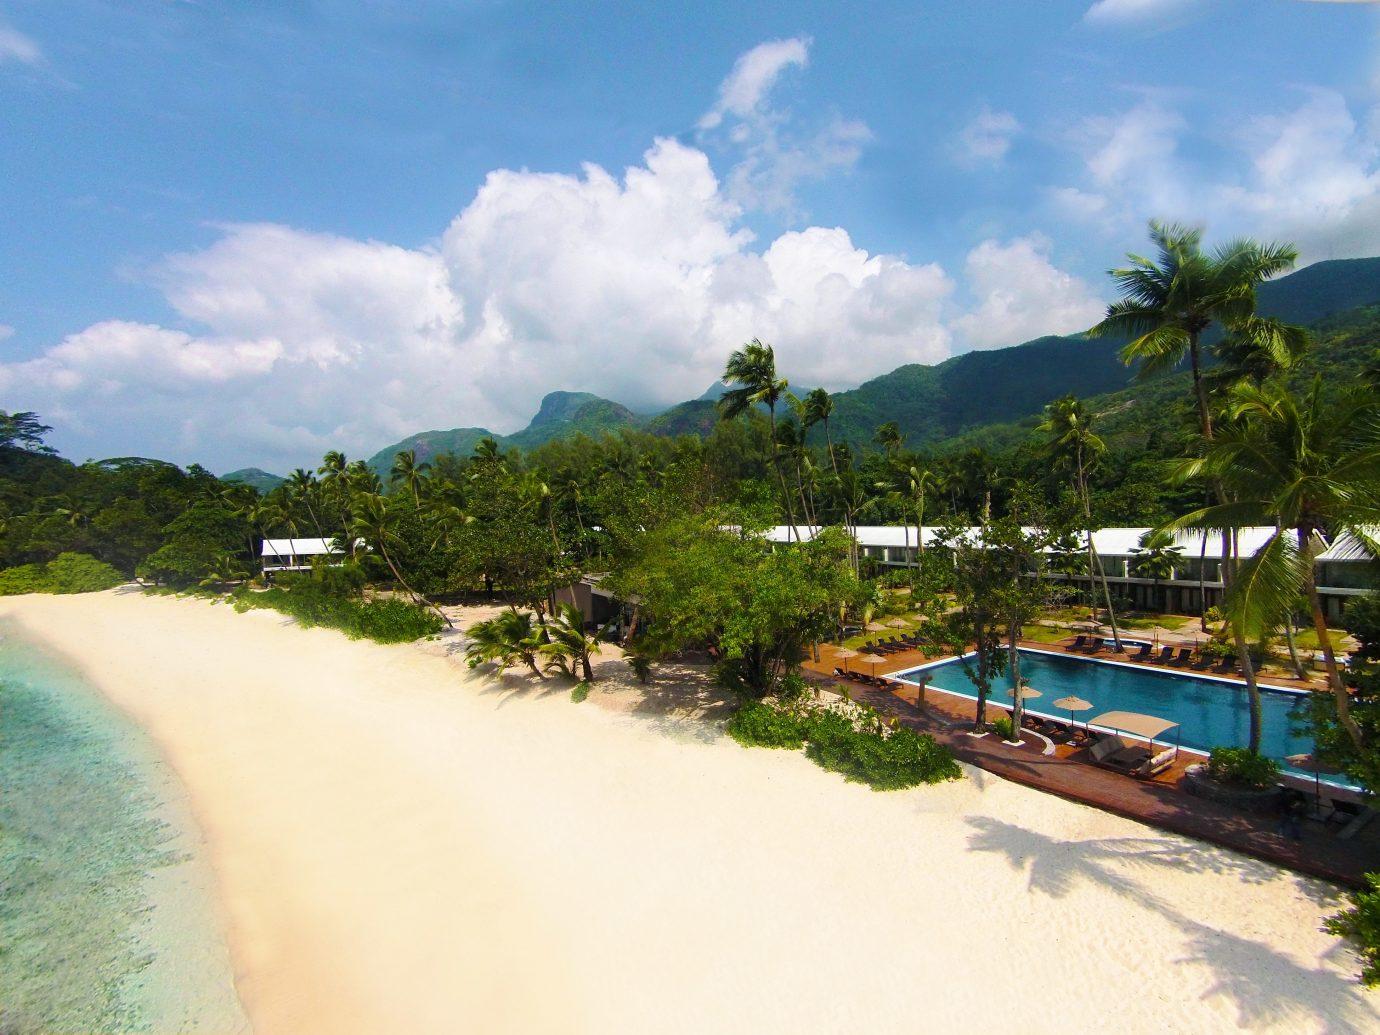 Beach Beachfront Hotels Luxury Pool Tropical sky outdoor Nature body of water Sea vacation Coast mountain bay caribbean Resort tropics Lagoon Island shore